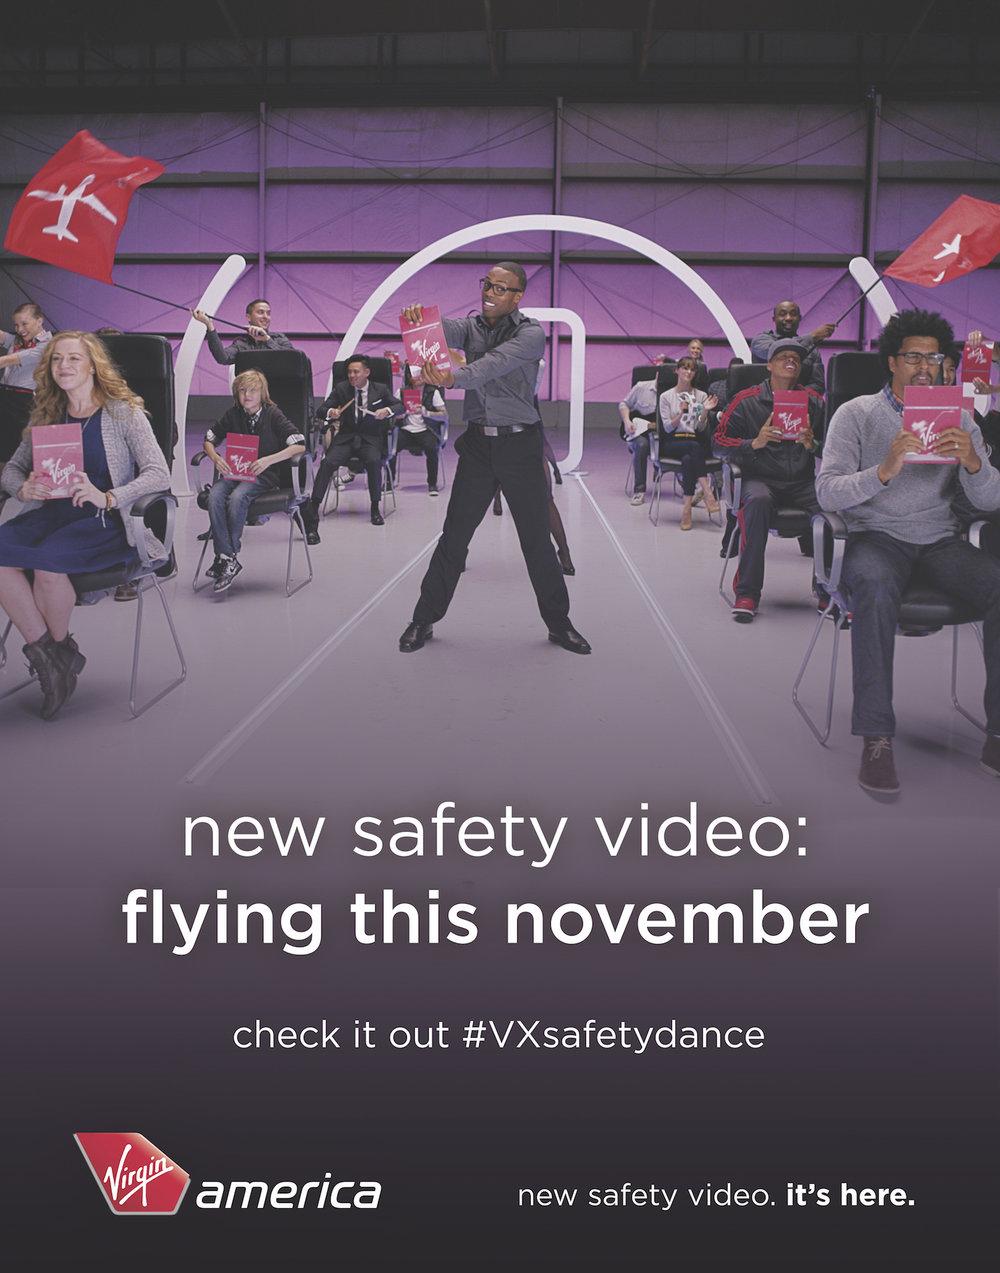 SafetyVideio_Signage_Main.jpg